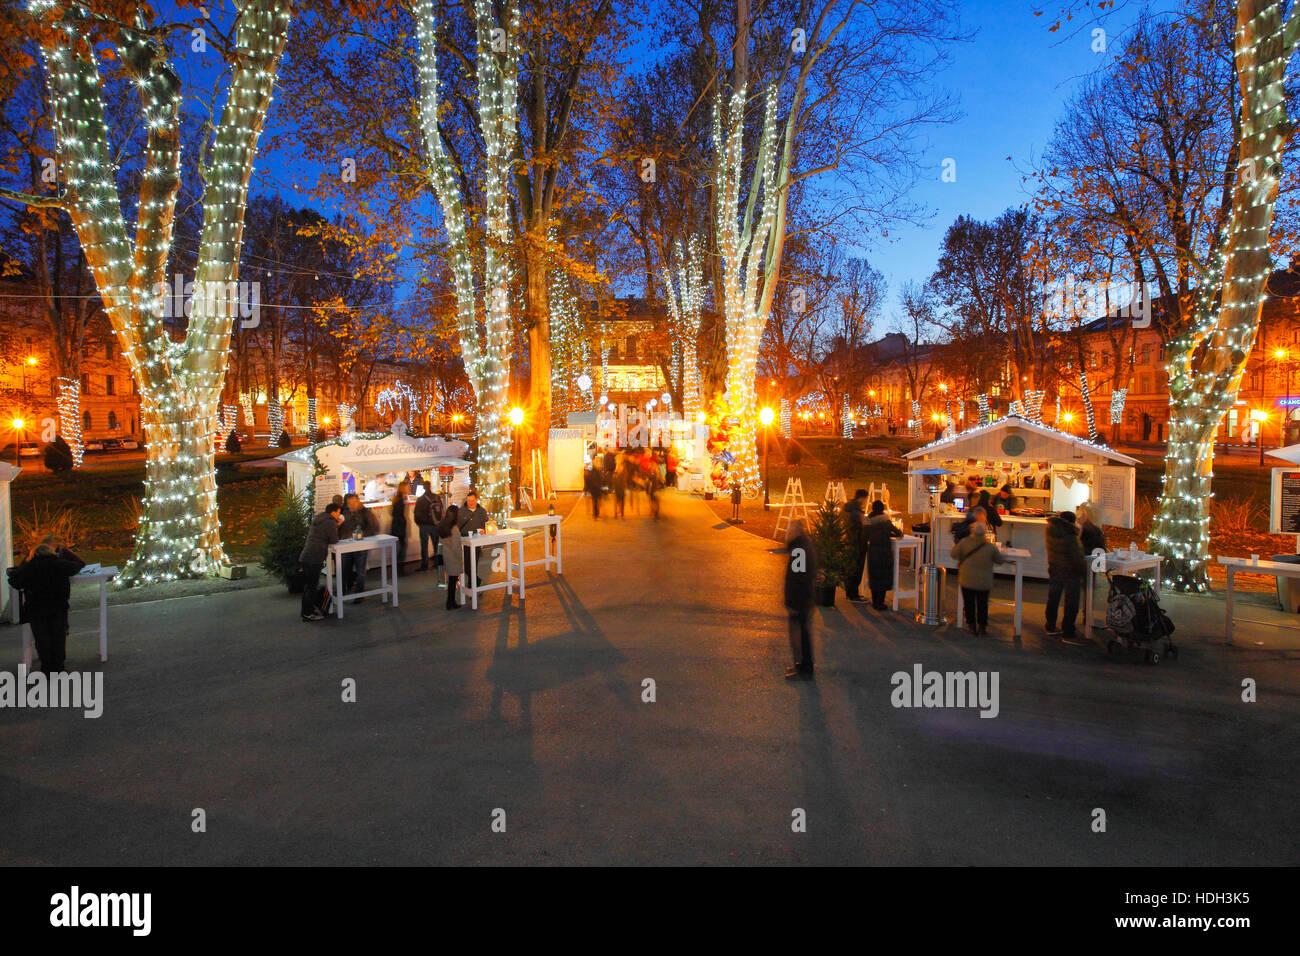 Illuminated Trees On Park Zrinjevac In Christmas Time In Zagreb City Stock Photo Alamy